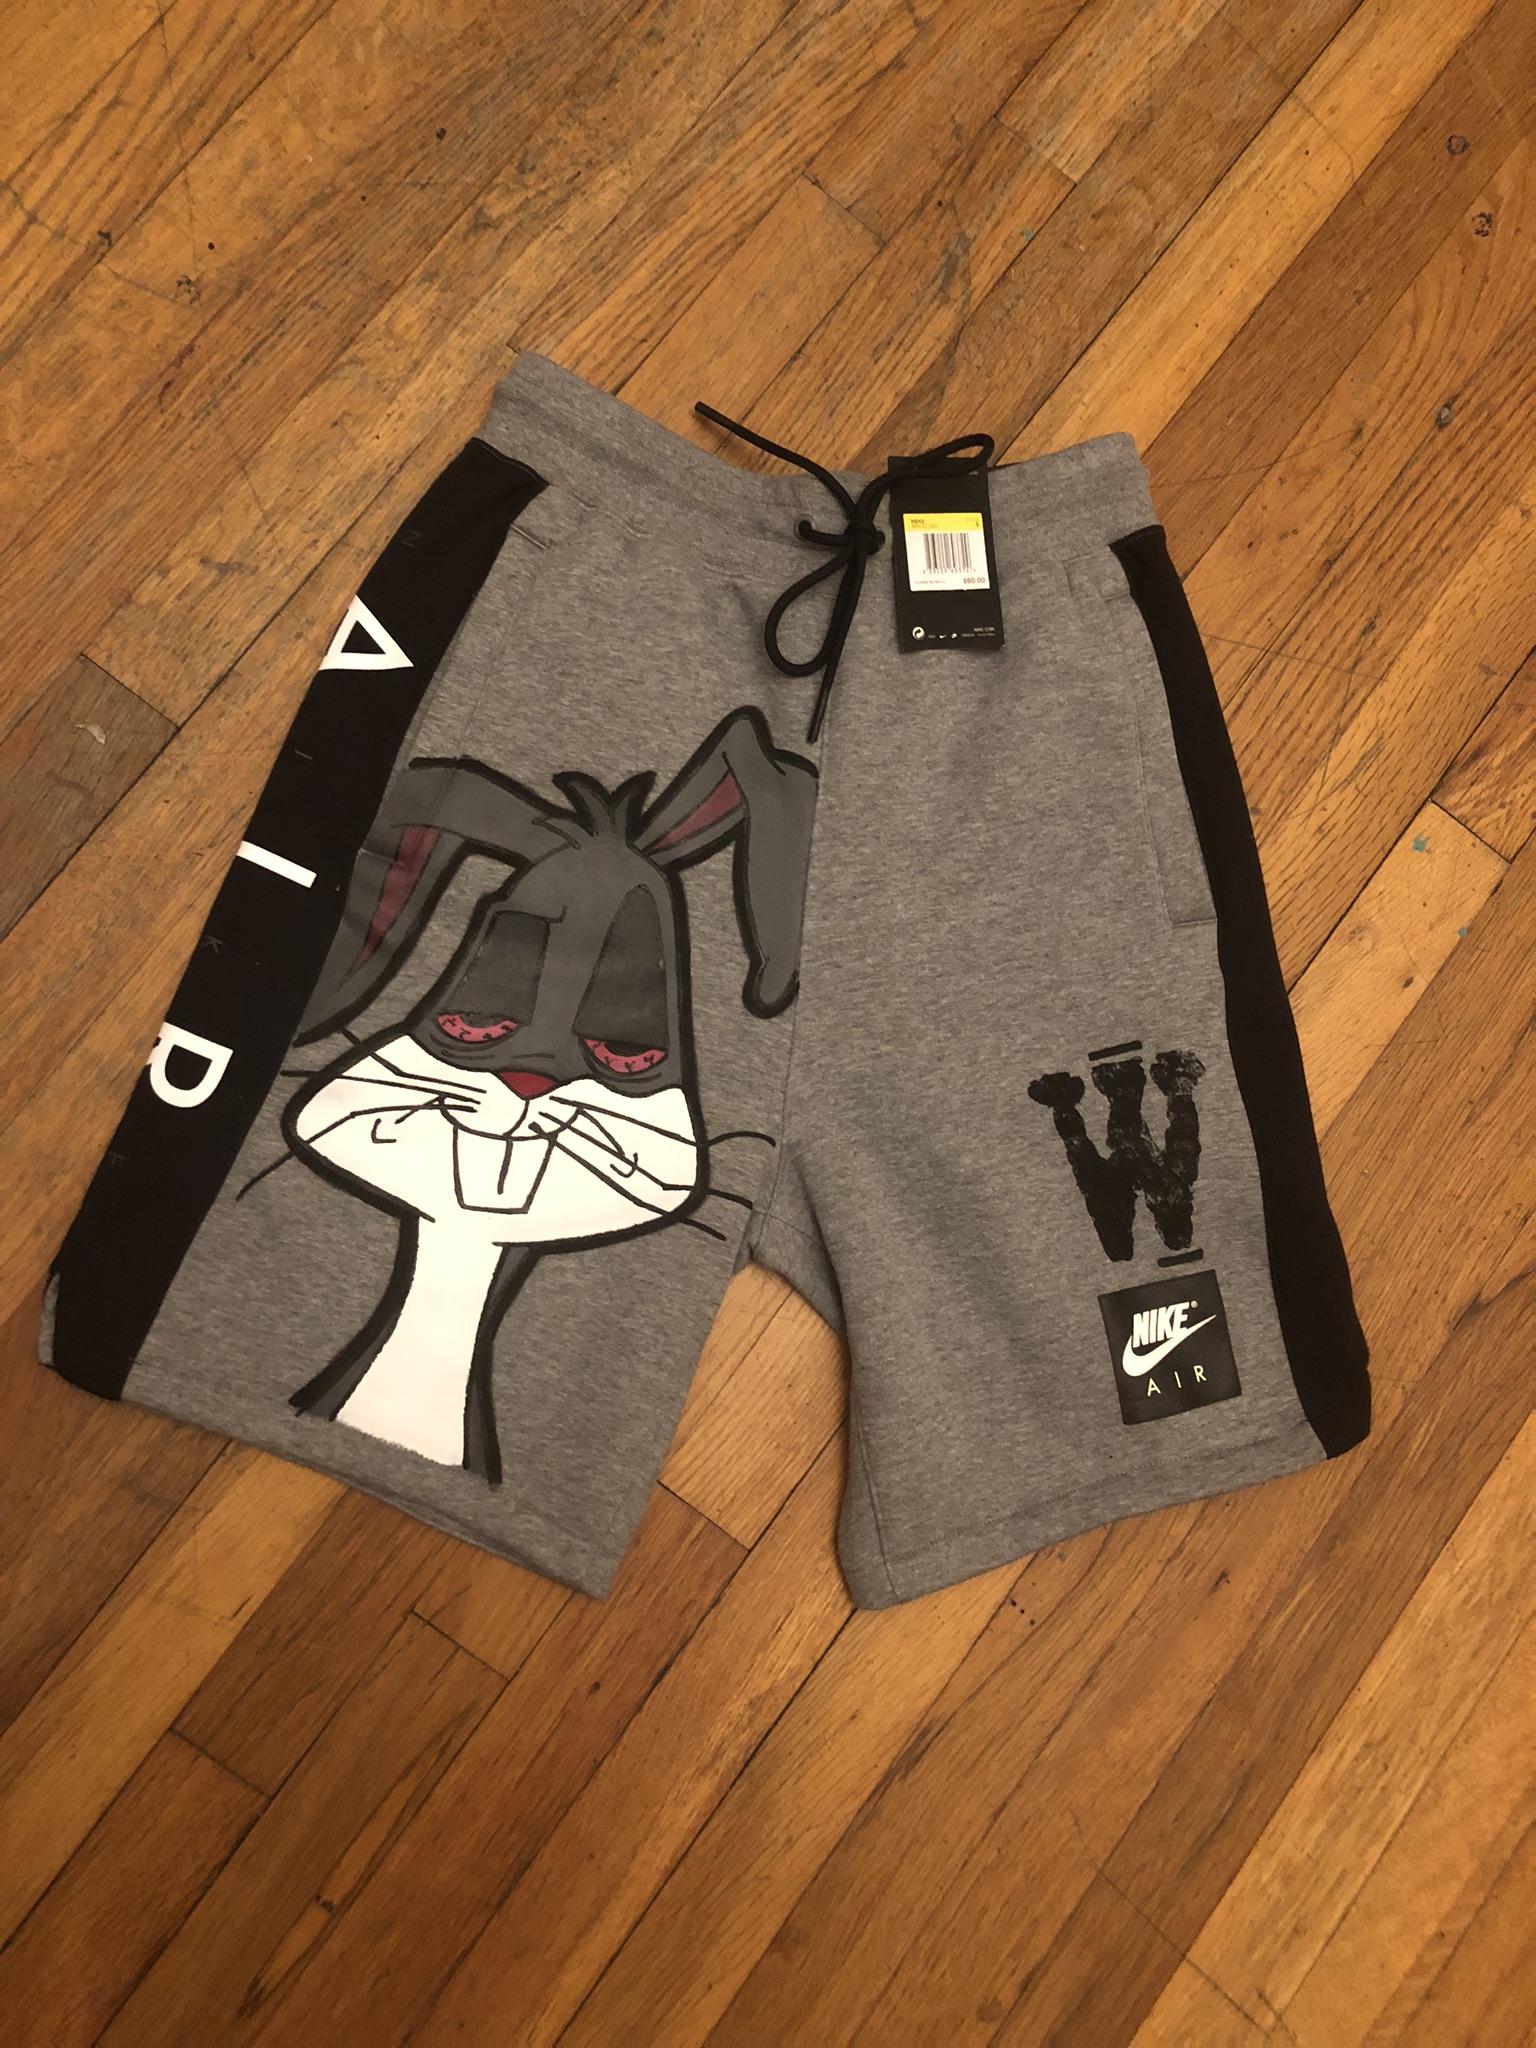 nike bugs bunny shorts